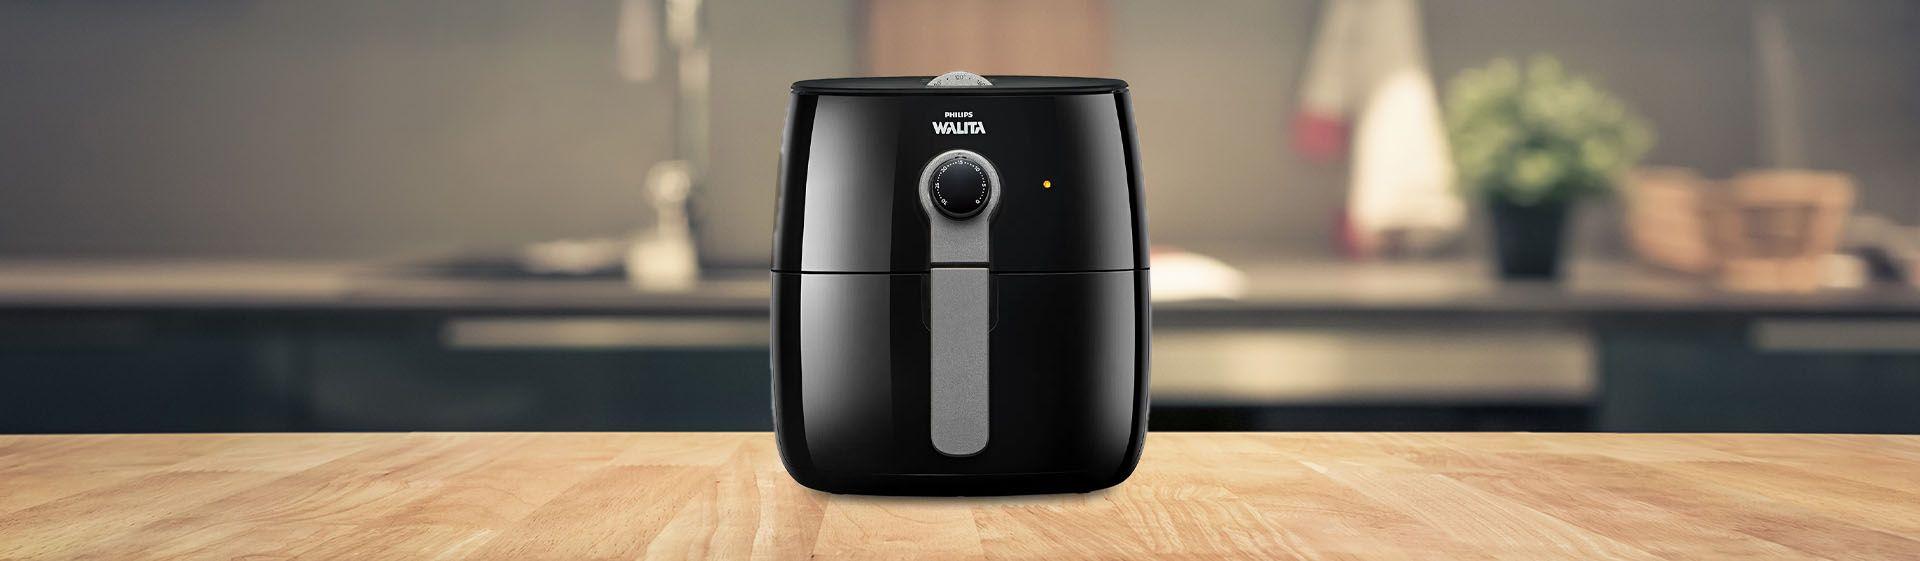 Airfryer Philips Walita Turbofryer vale a pena? Confira a análise de ficha técnica dessa fritadeira elétrica